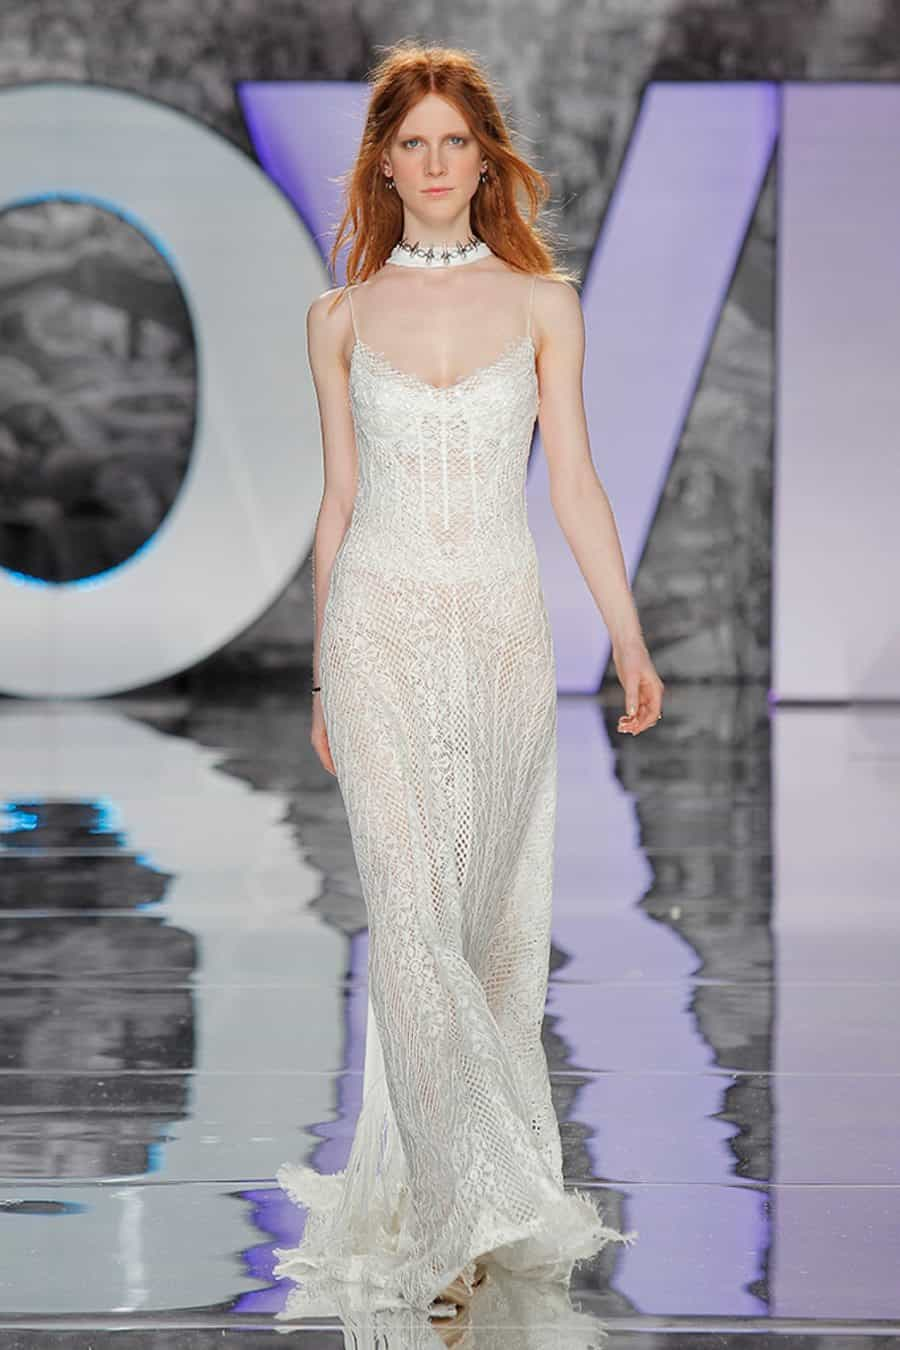 yolancris-weddingdress-bride-boho-chic-folk-wedding-dress-couture-fashion-desing-bohodress-42